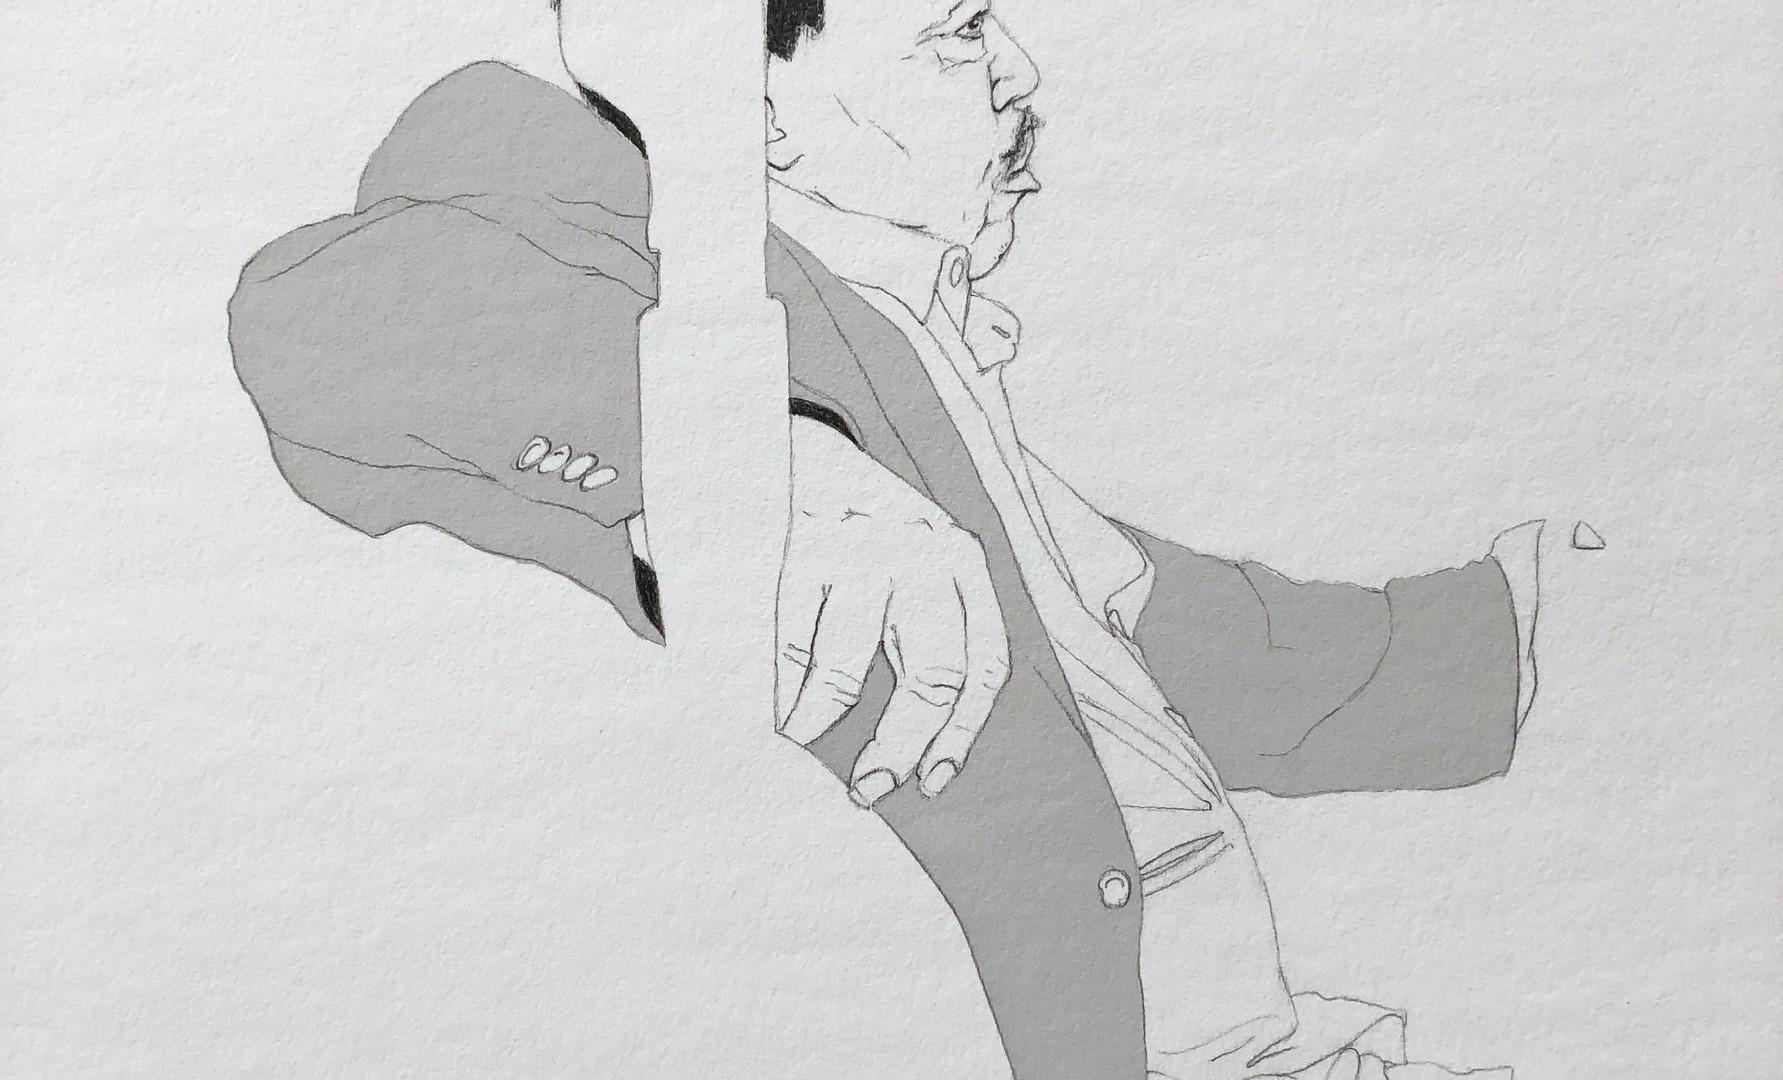 pencil-drawing-man-on-bus.jpg